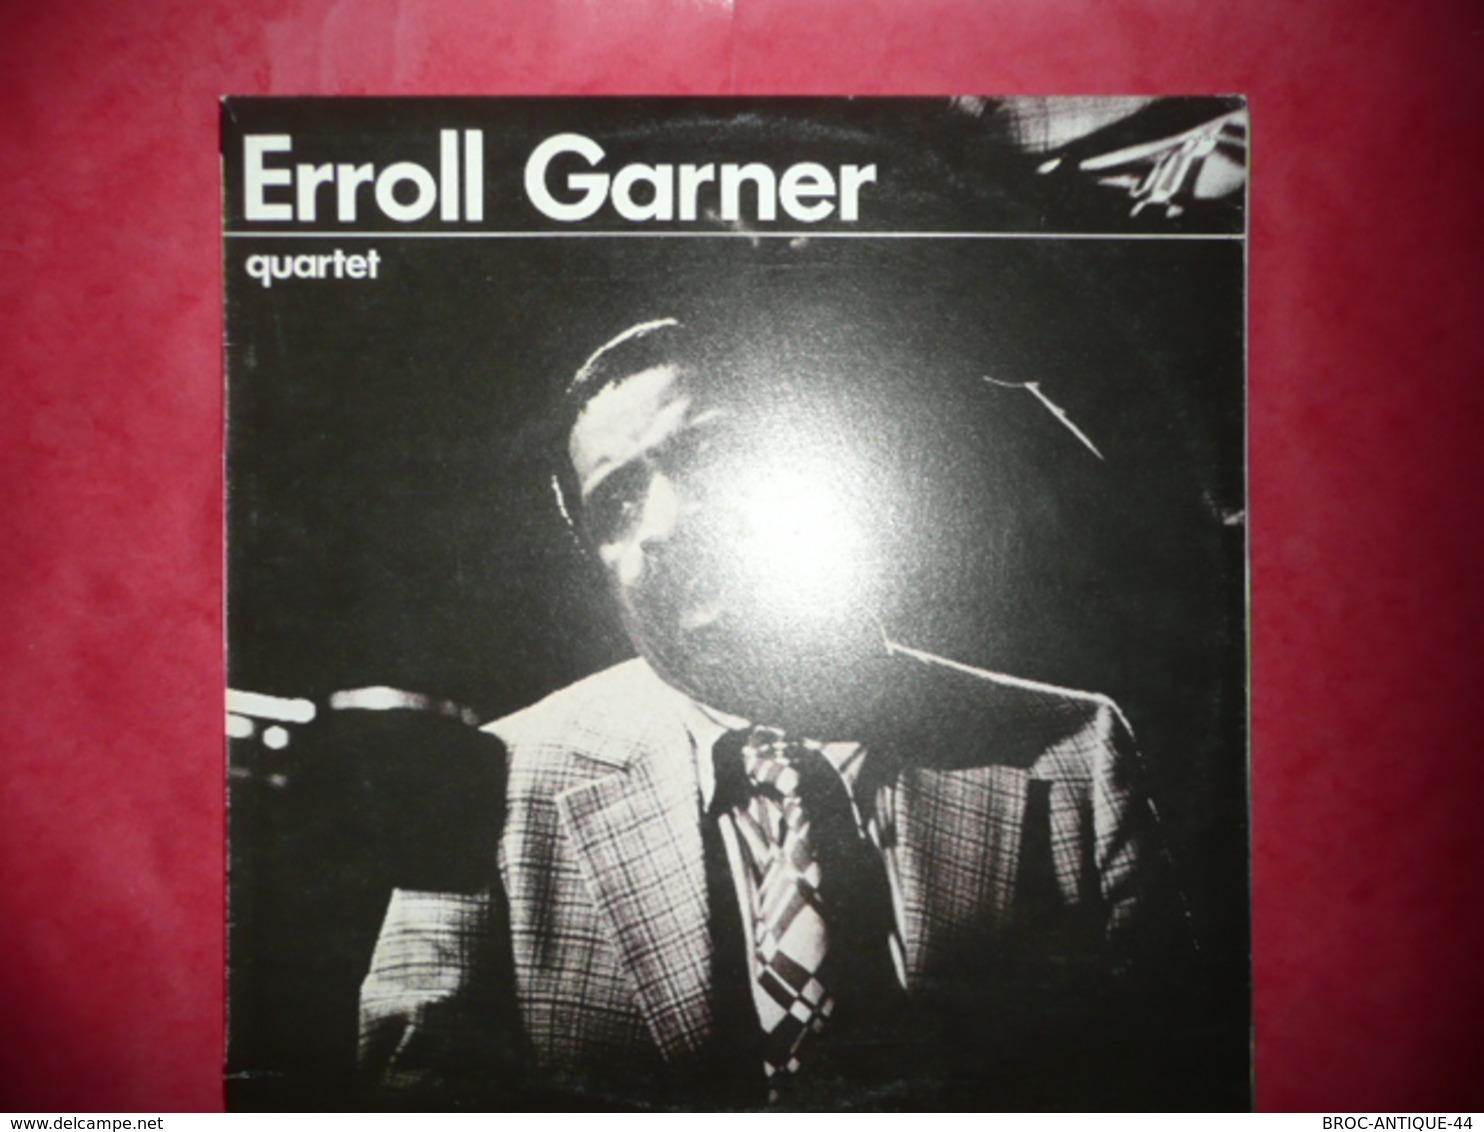 LP33 N°2929 - ERROLL GARNER - QUARTET - LPUP 5115 - DISQUE EPAIS ***** - Jazz